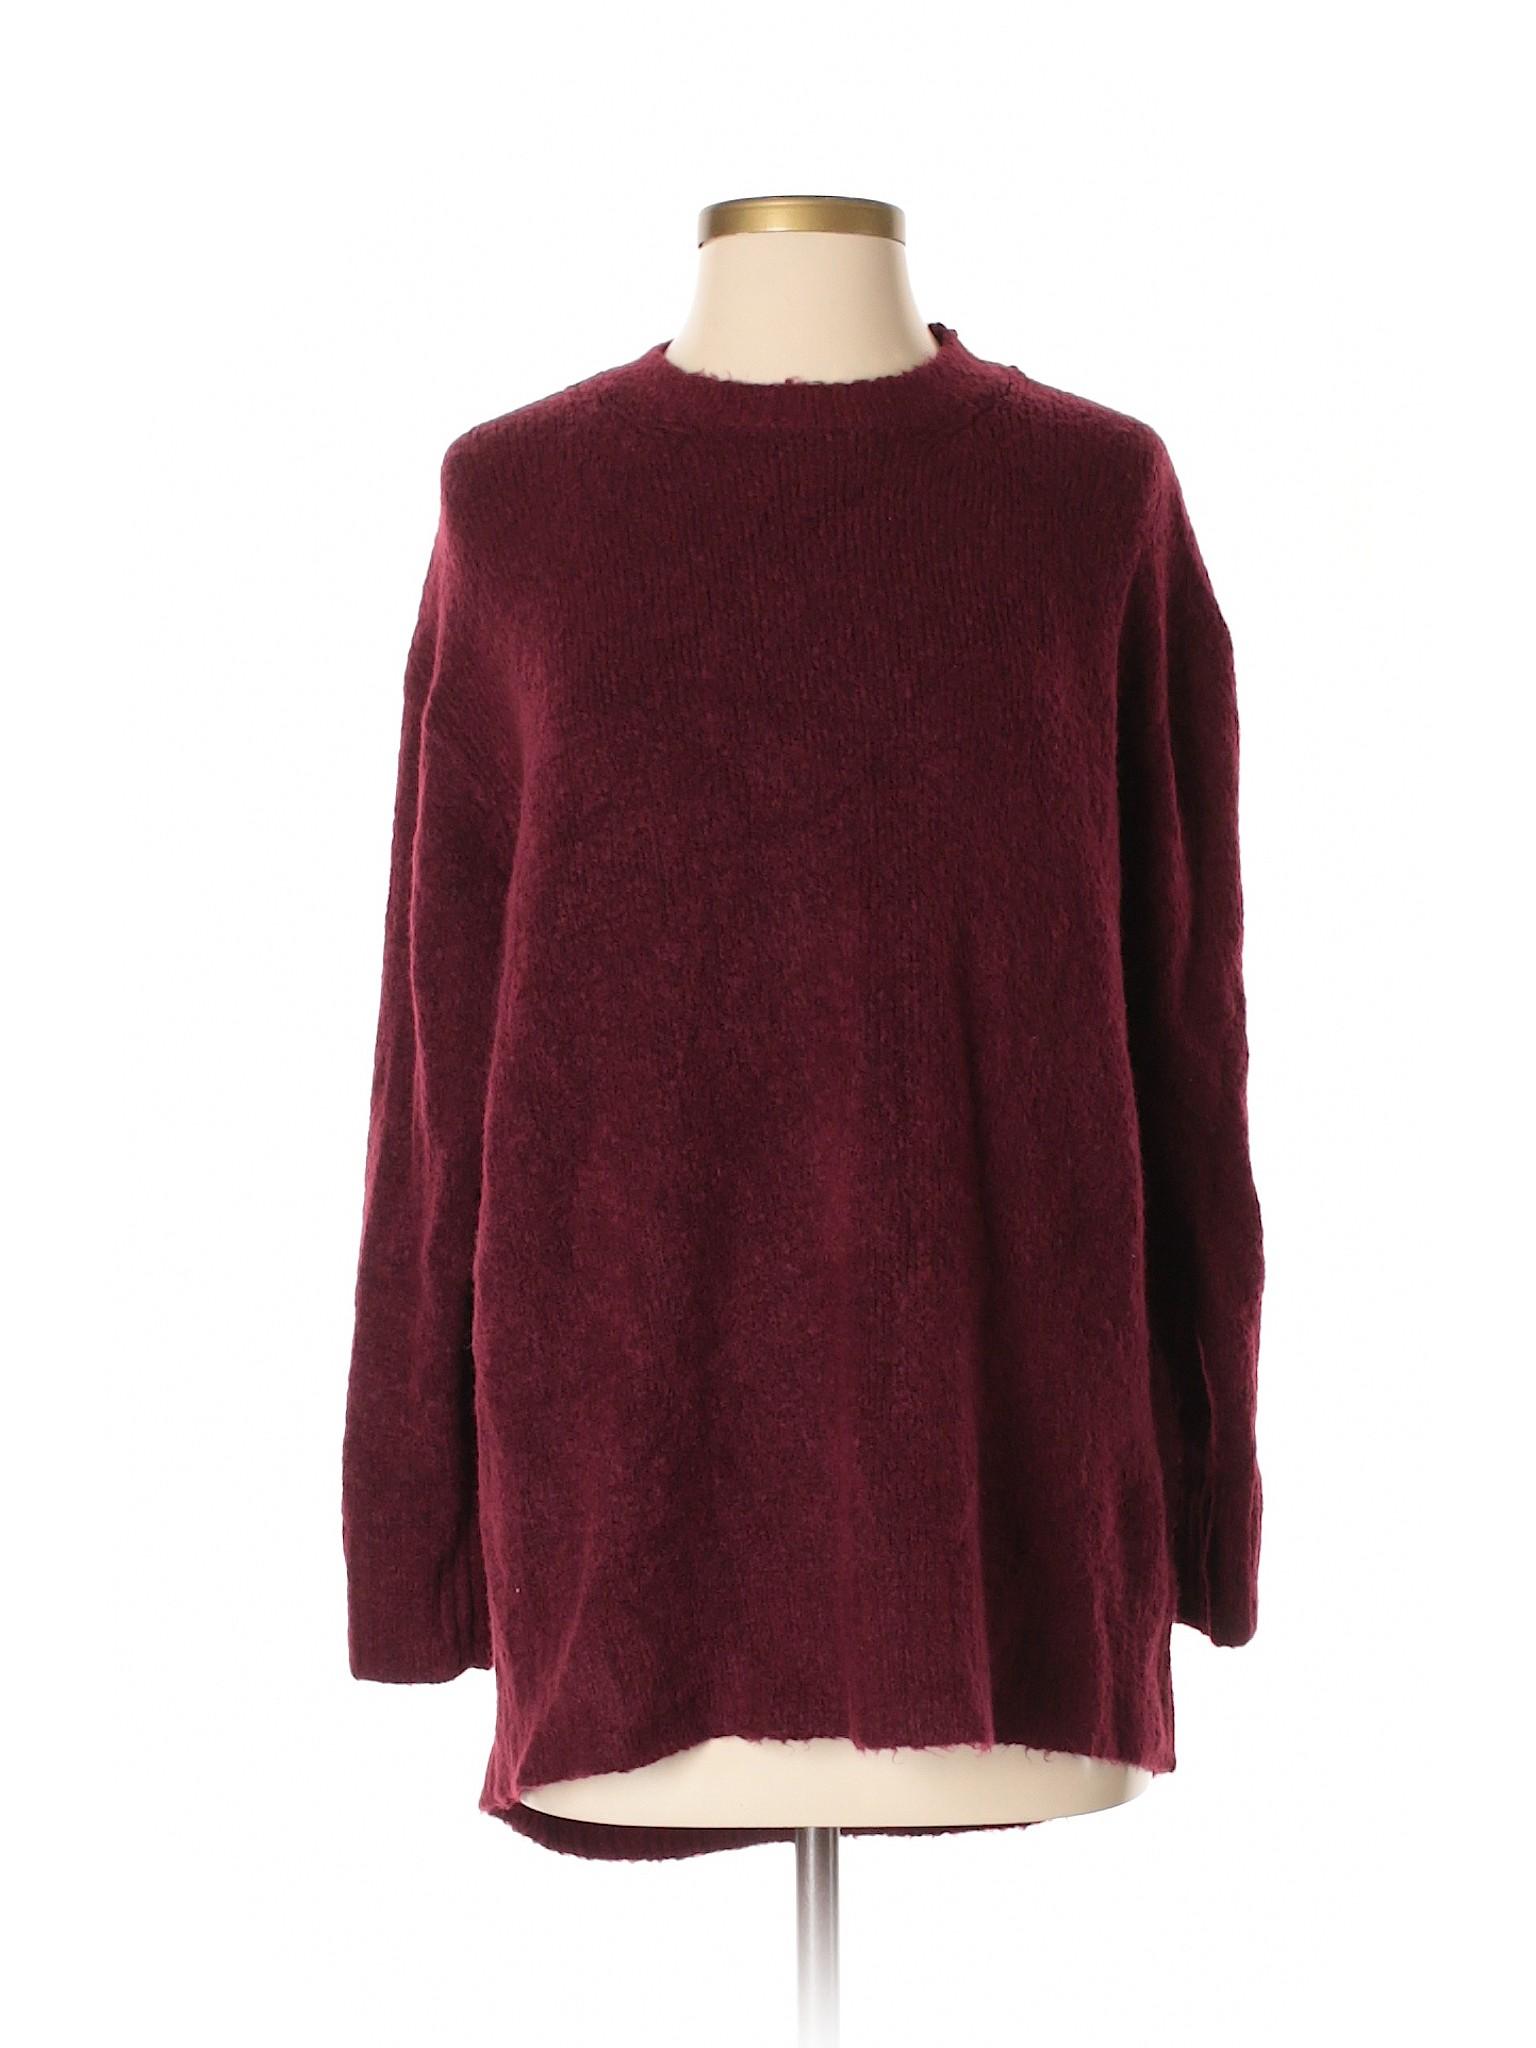 Sweater Pullover Sweater Pullover Zara Zara Boutique Boutique Boutique Sweater Pullover Zara qUwvwE